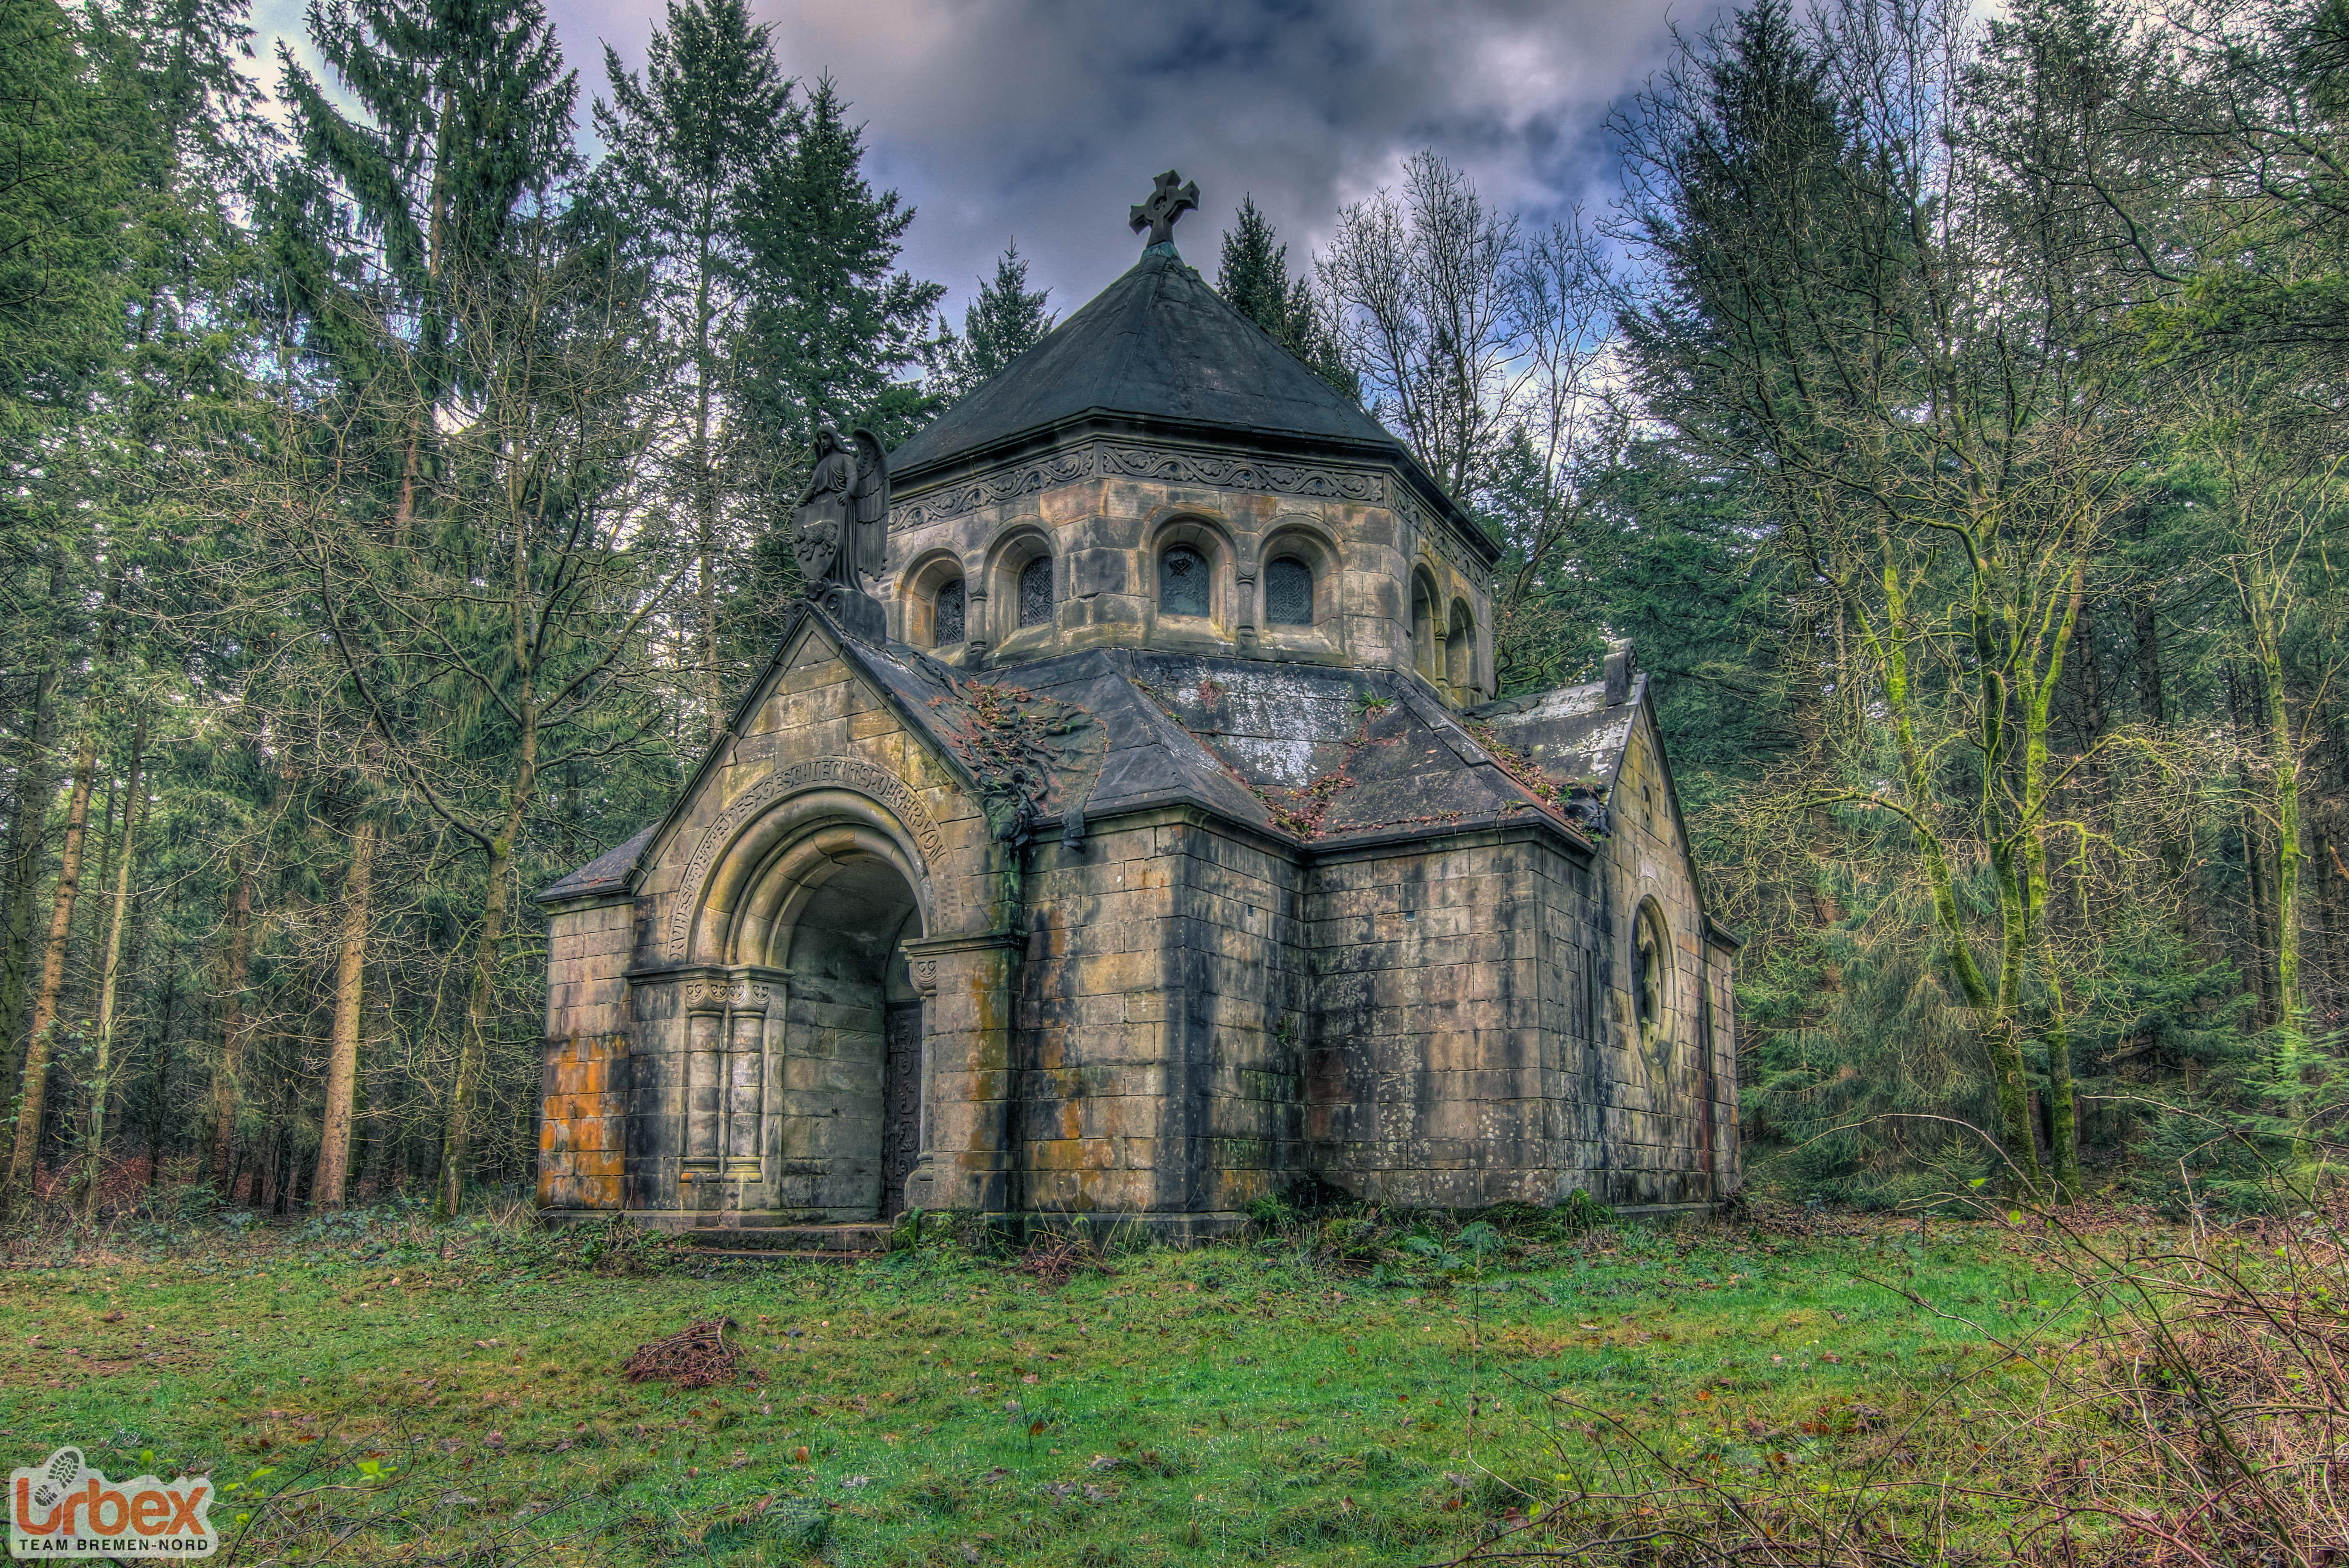 Mausoleum S. - Urbex Team Bremen-Nord